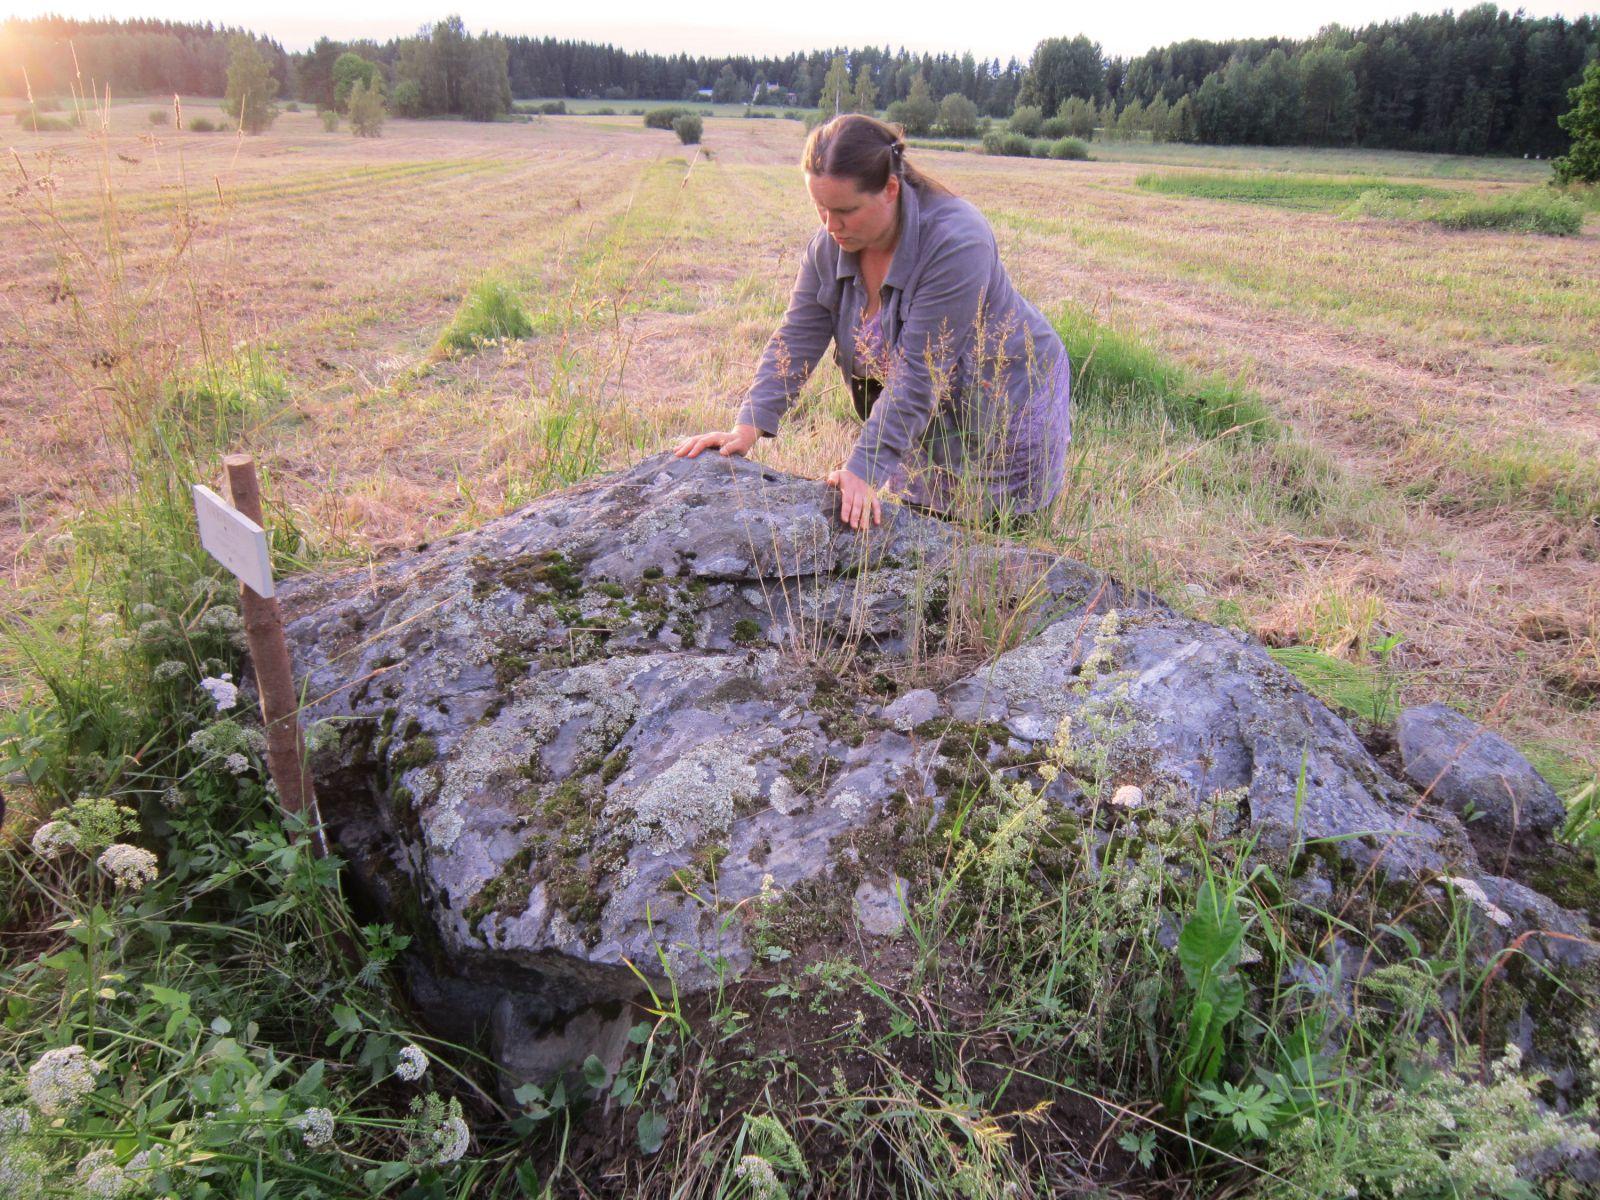 Nainen kuppikivellä / Woman by a sacrificial stone